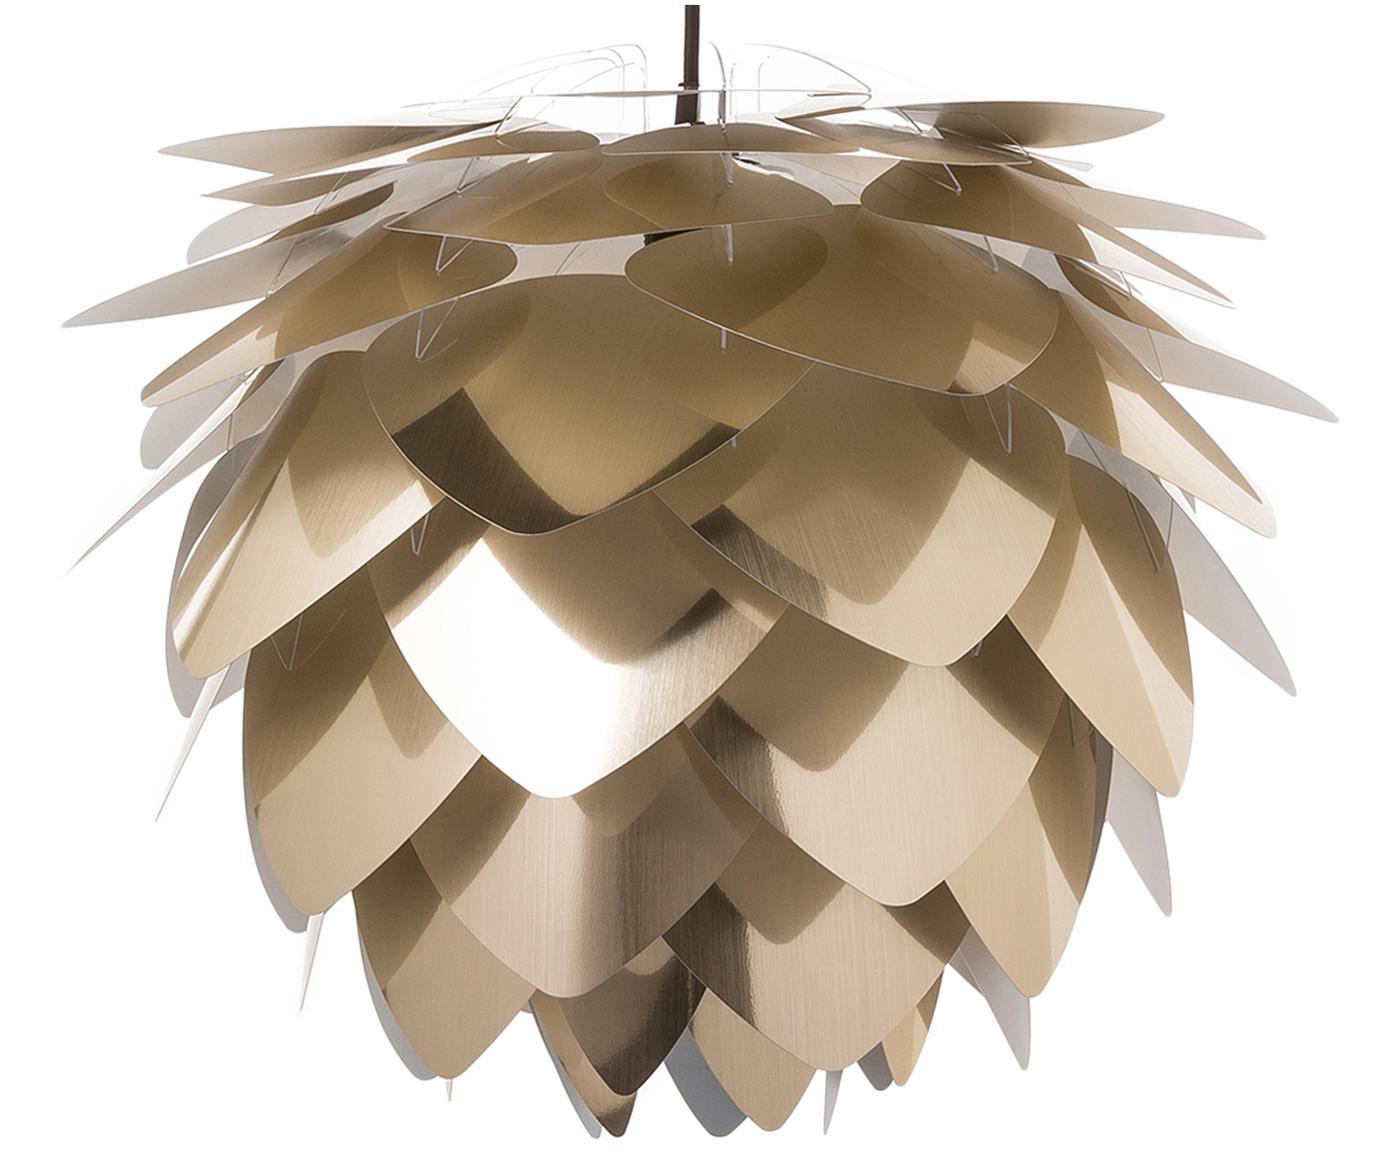 Hanglamp Silvia, bouwpakket, Polypropyleen, polycarbonaat, Lampenkap: messingkleurig. Snoerpendel: zwart, Ø 50 x H 41 cm